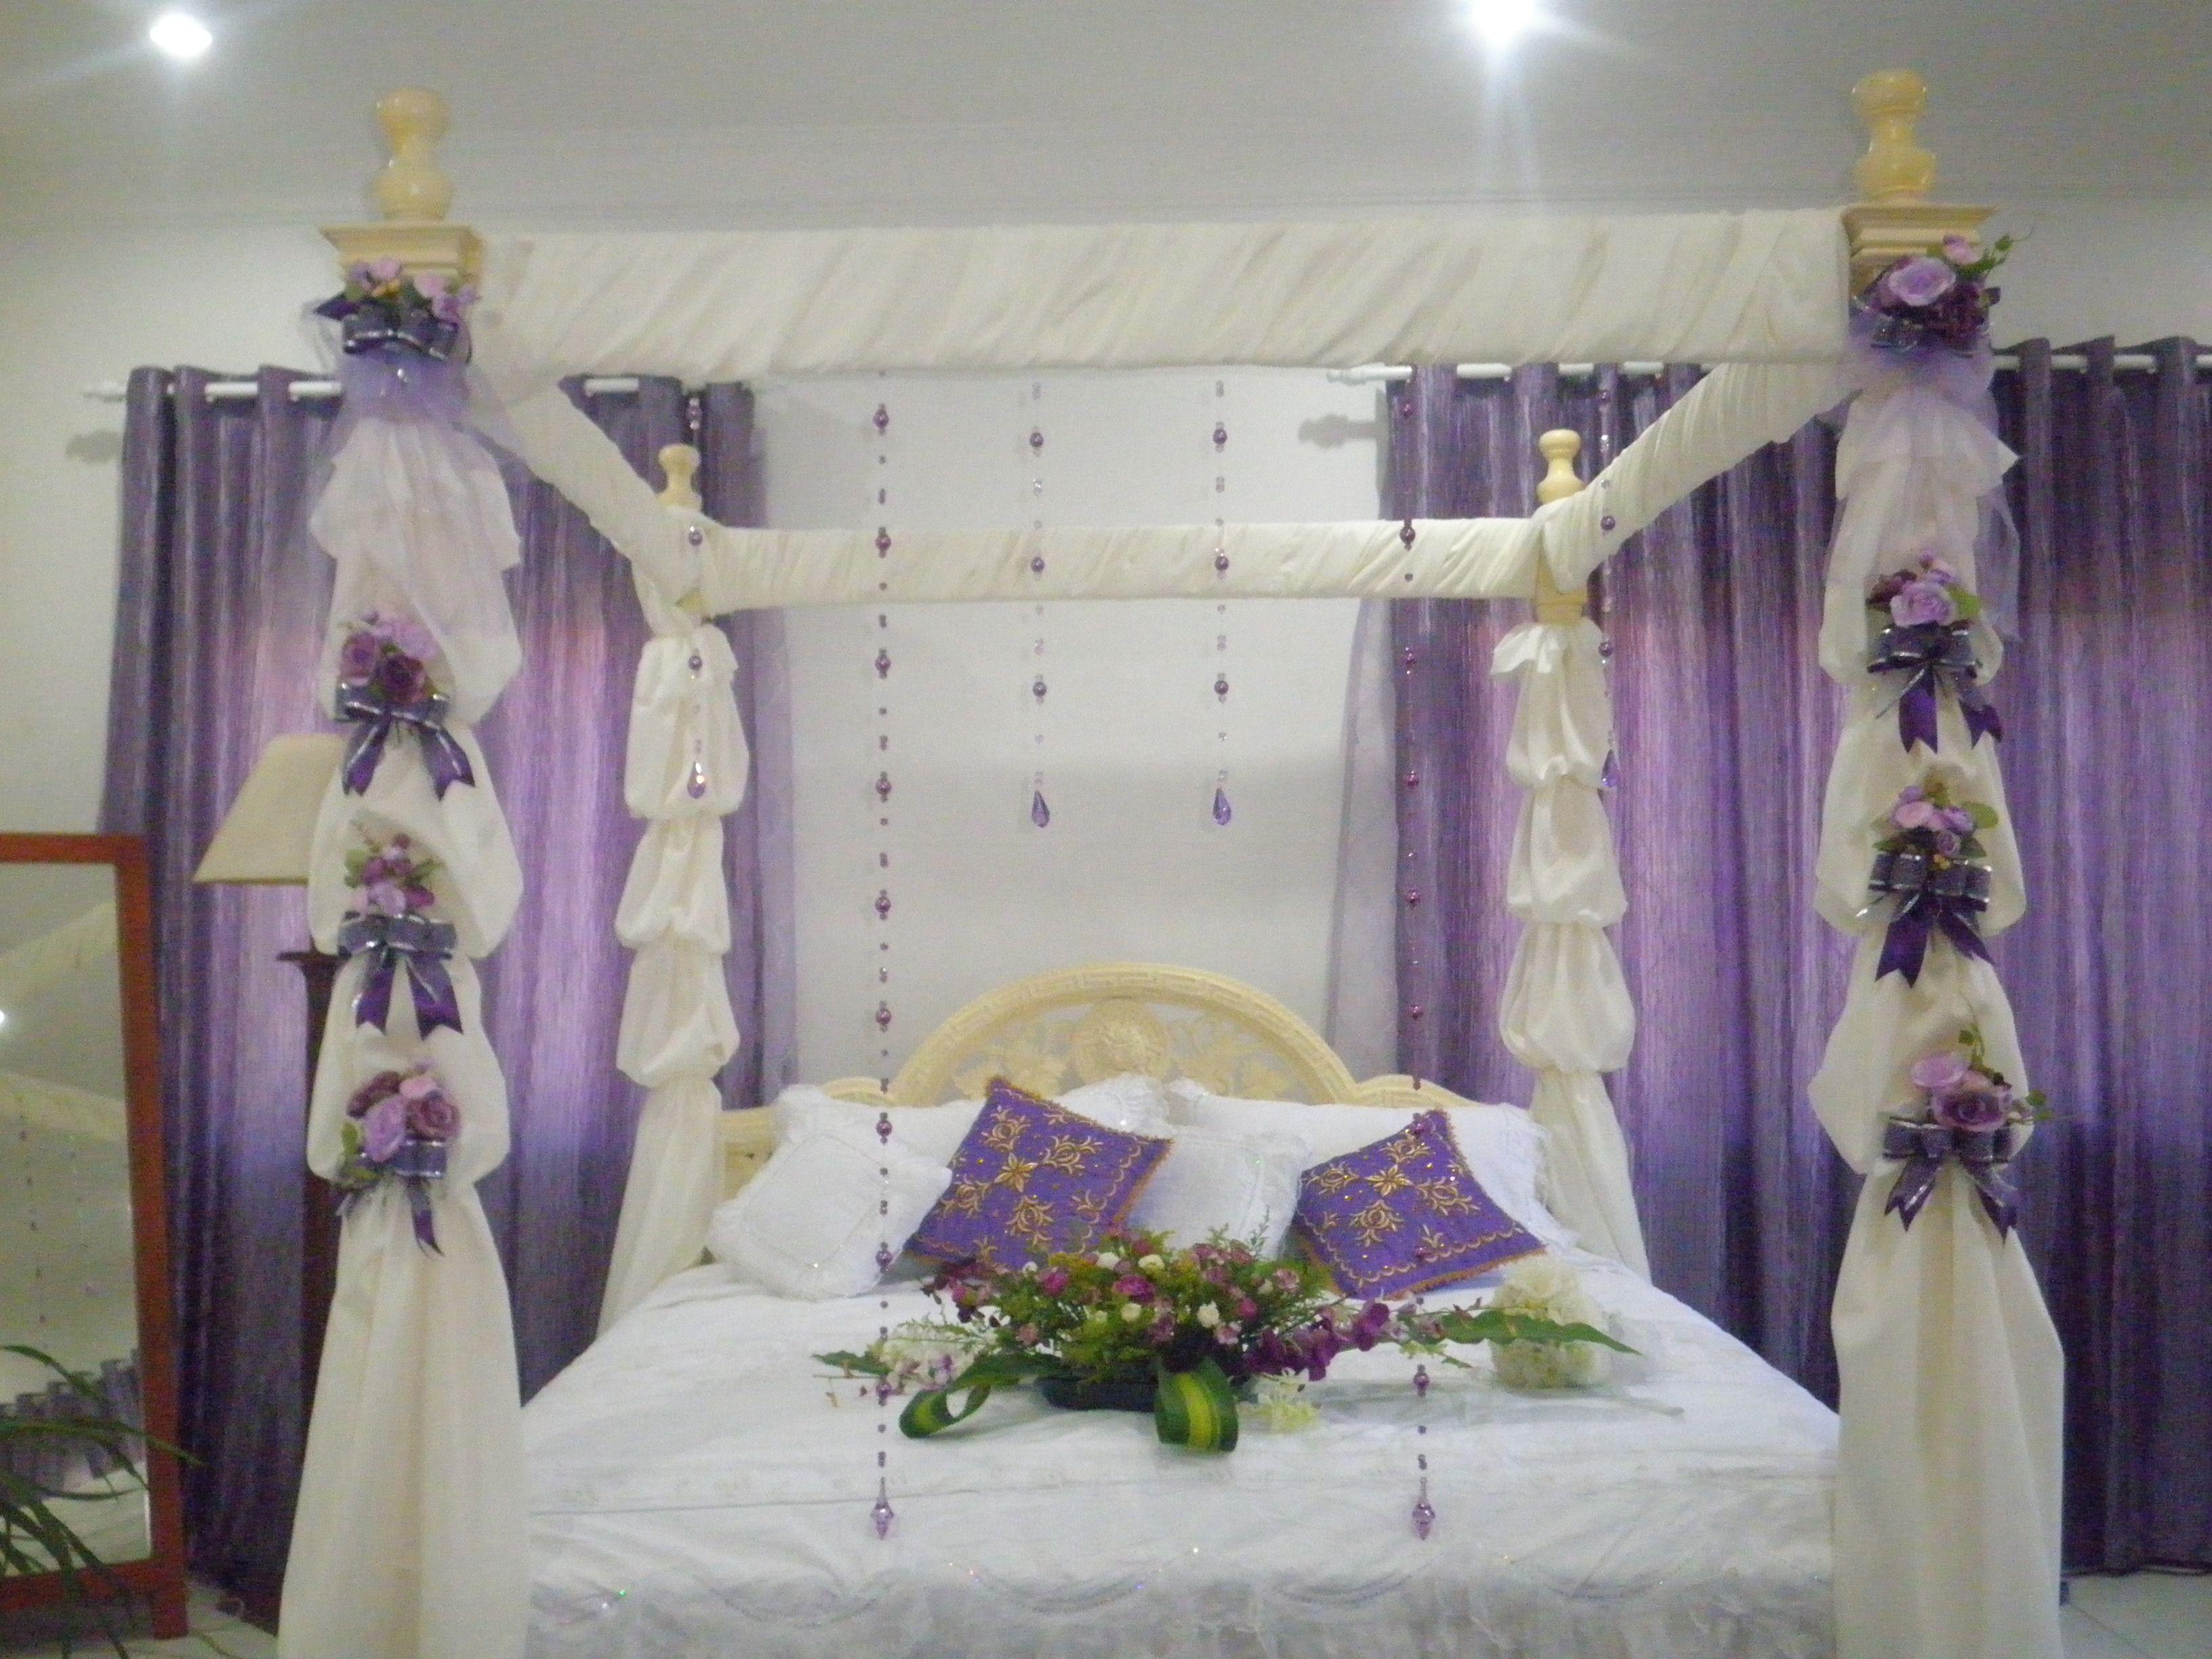 Wedding Room Decoration Ideas In Pakistan 2016 | Wedding ...